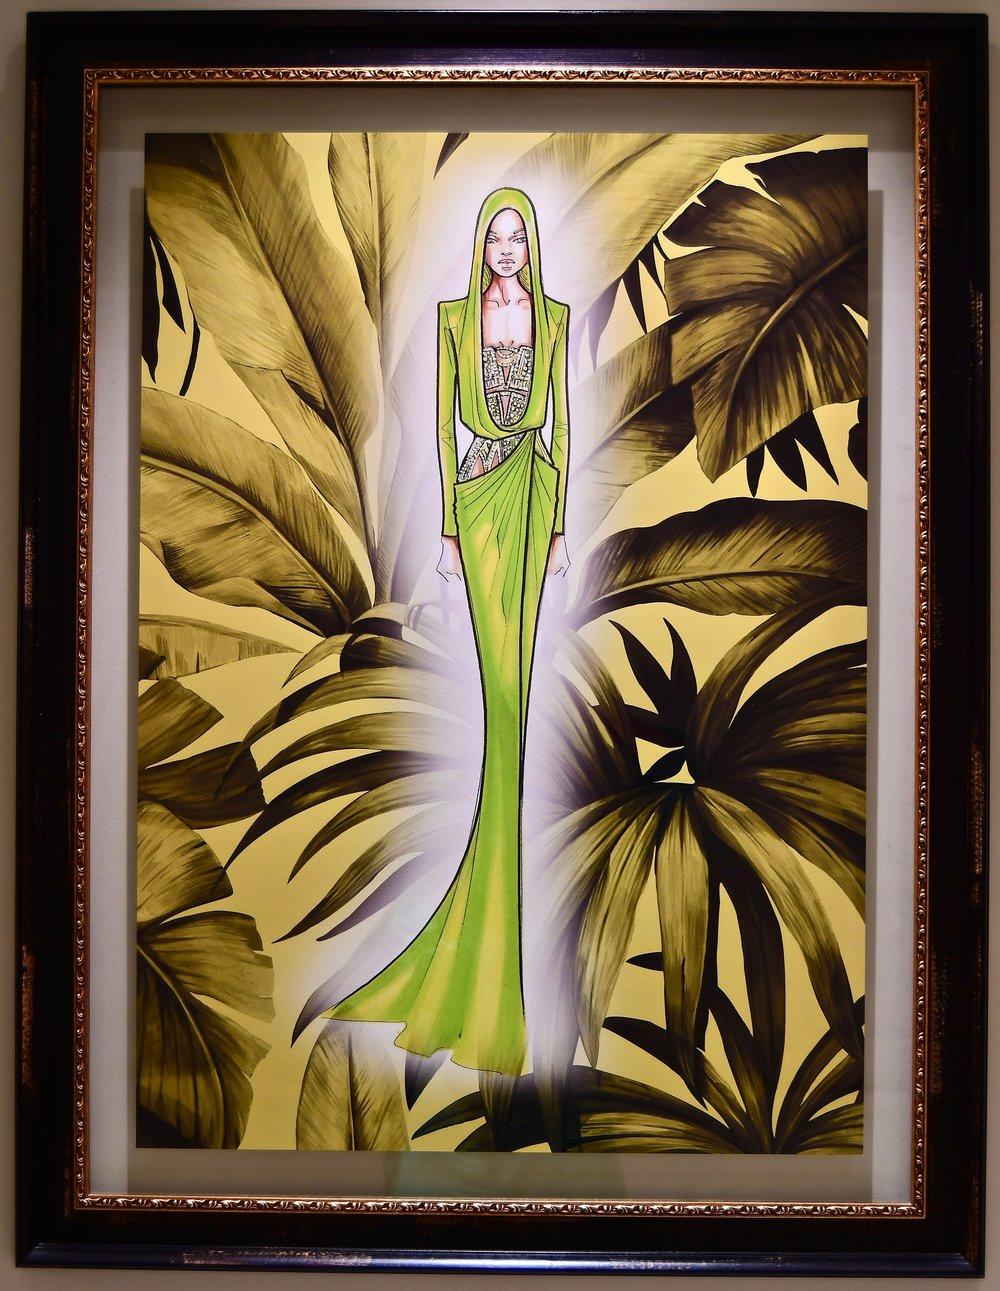 Hallway Decor - Framed Versace Sketch (Palazzo Versace Dubai)